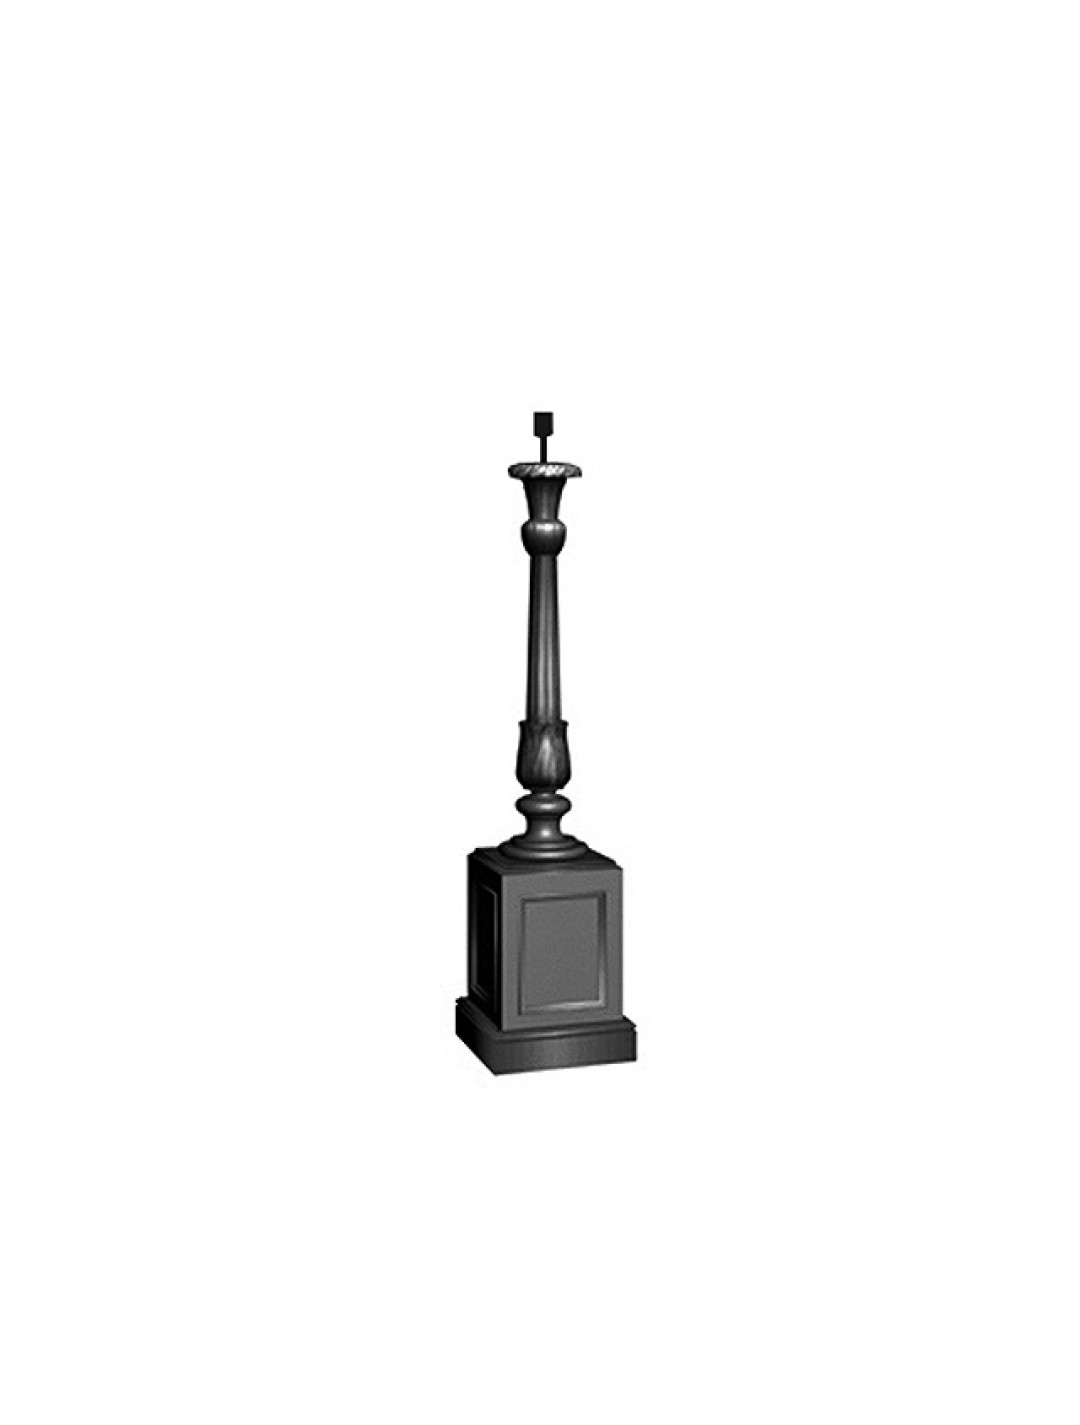 ELIZABETH WOODEN CARVED HIGH LAMP STAND,